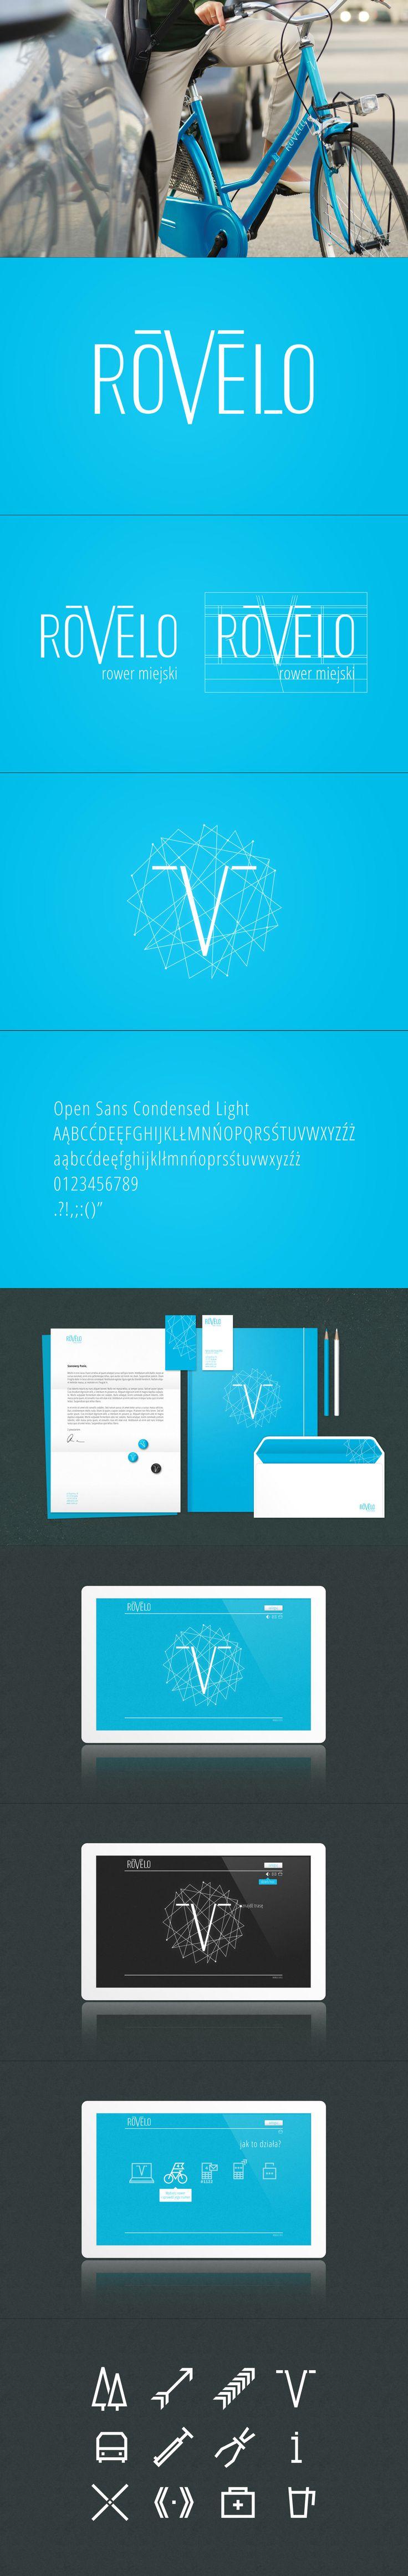 Rovelo. #branding #design #logo #identity #corporate #id #print #pleo